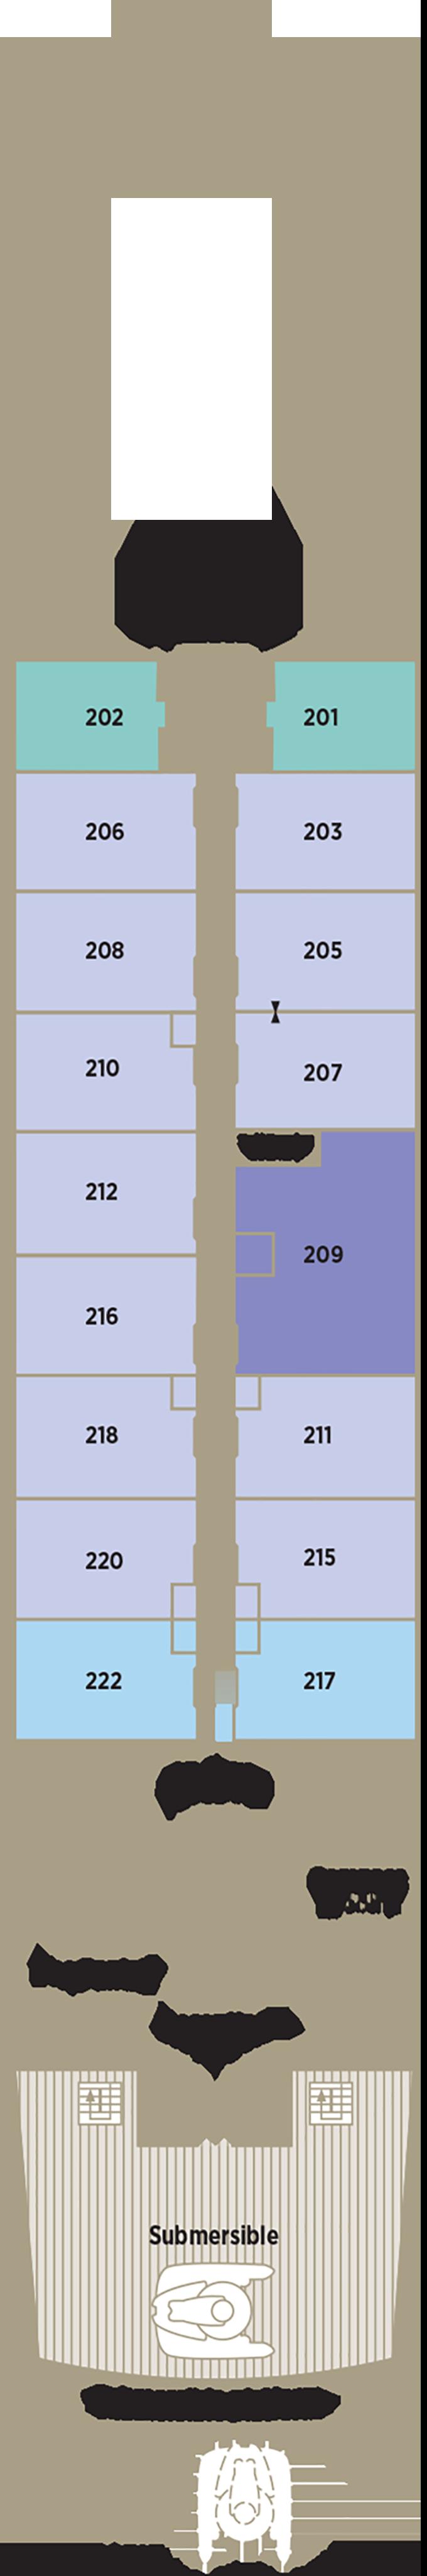 Sunbreeze Deck